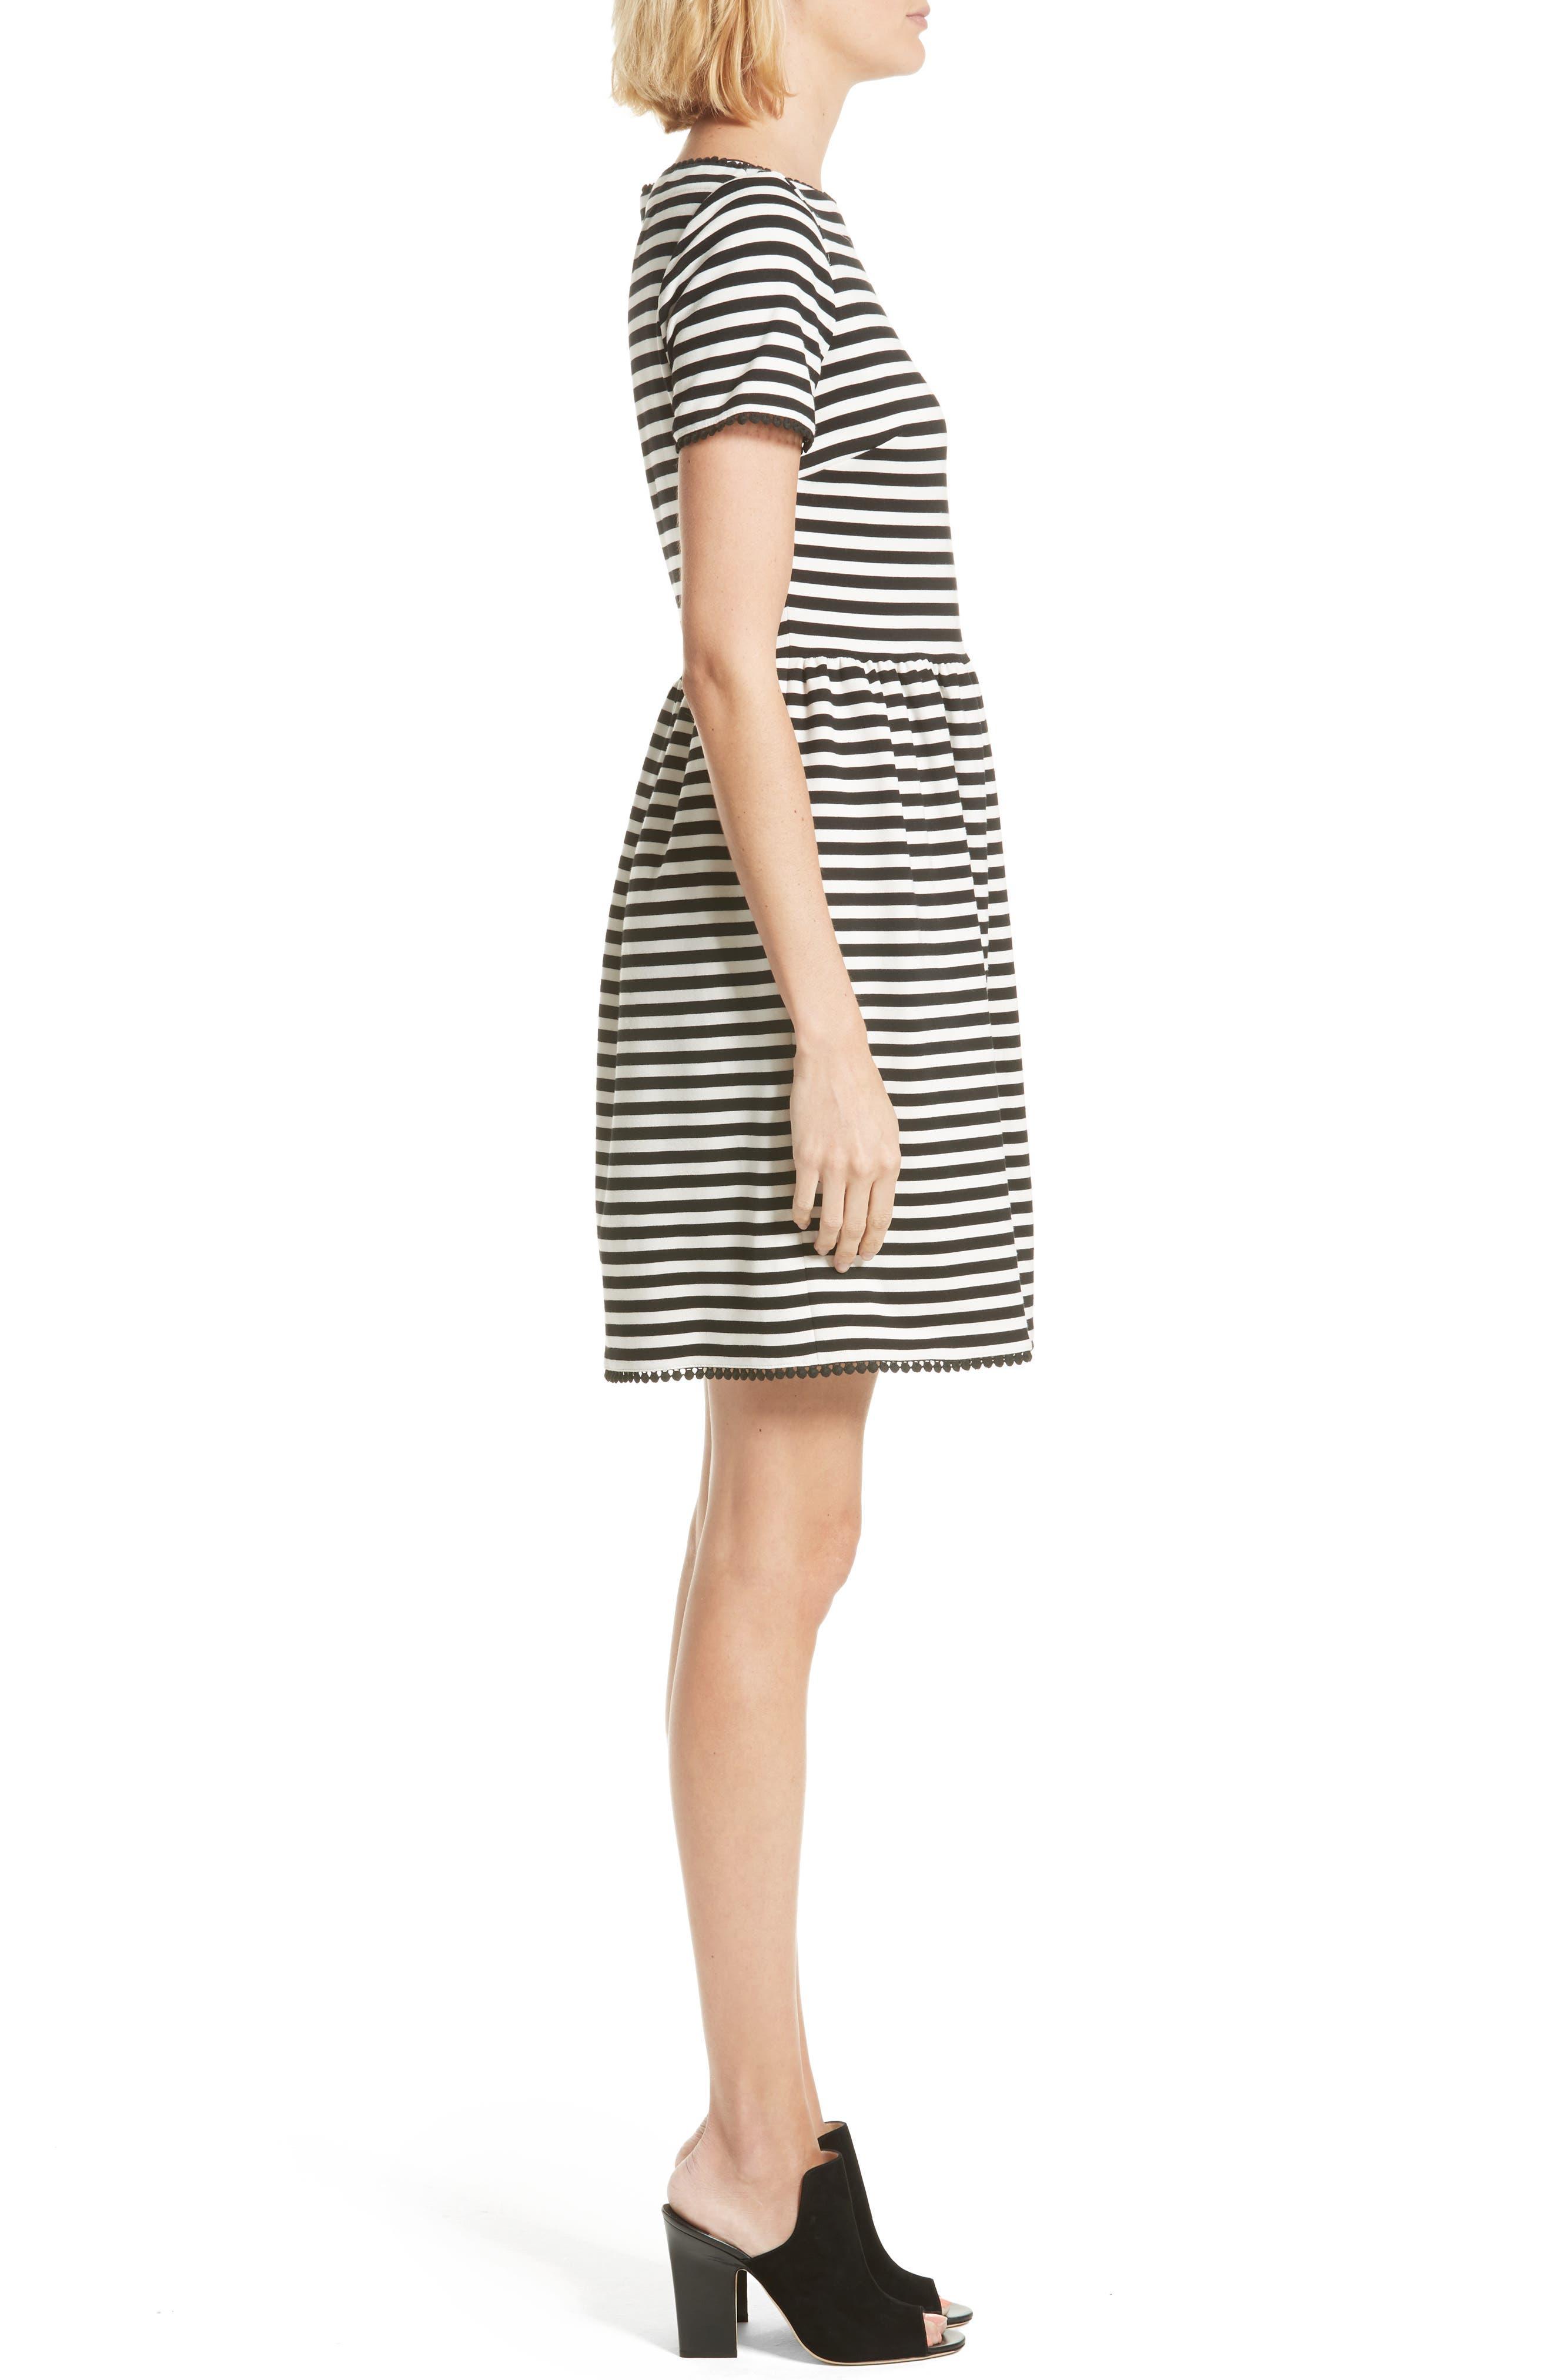 KATE SPADE NEW YORK,                             stripe ponte dress,                             Alternate thumbnail 3, color,                             900